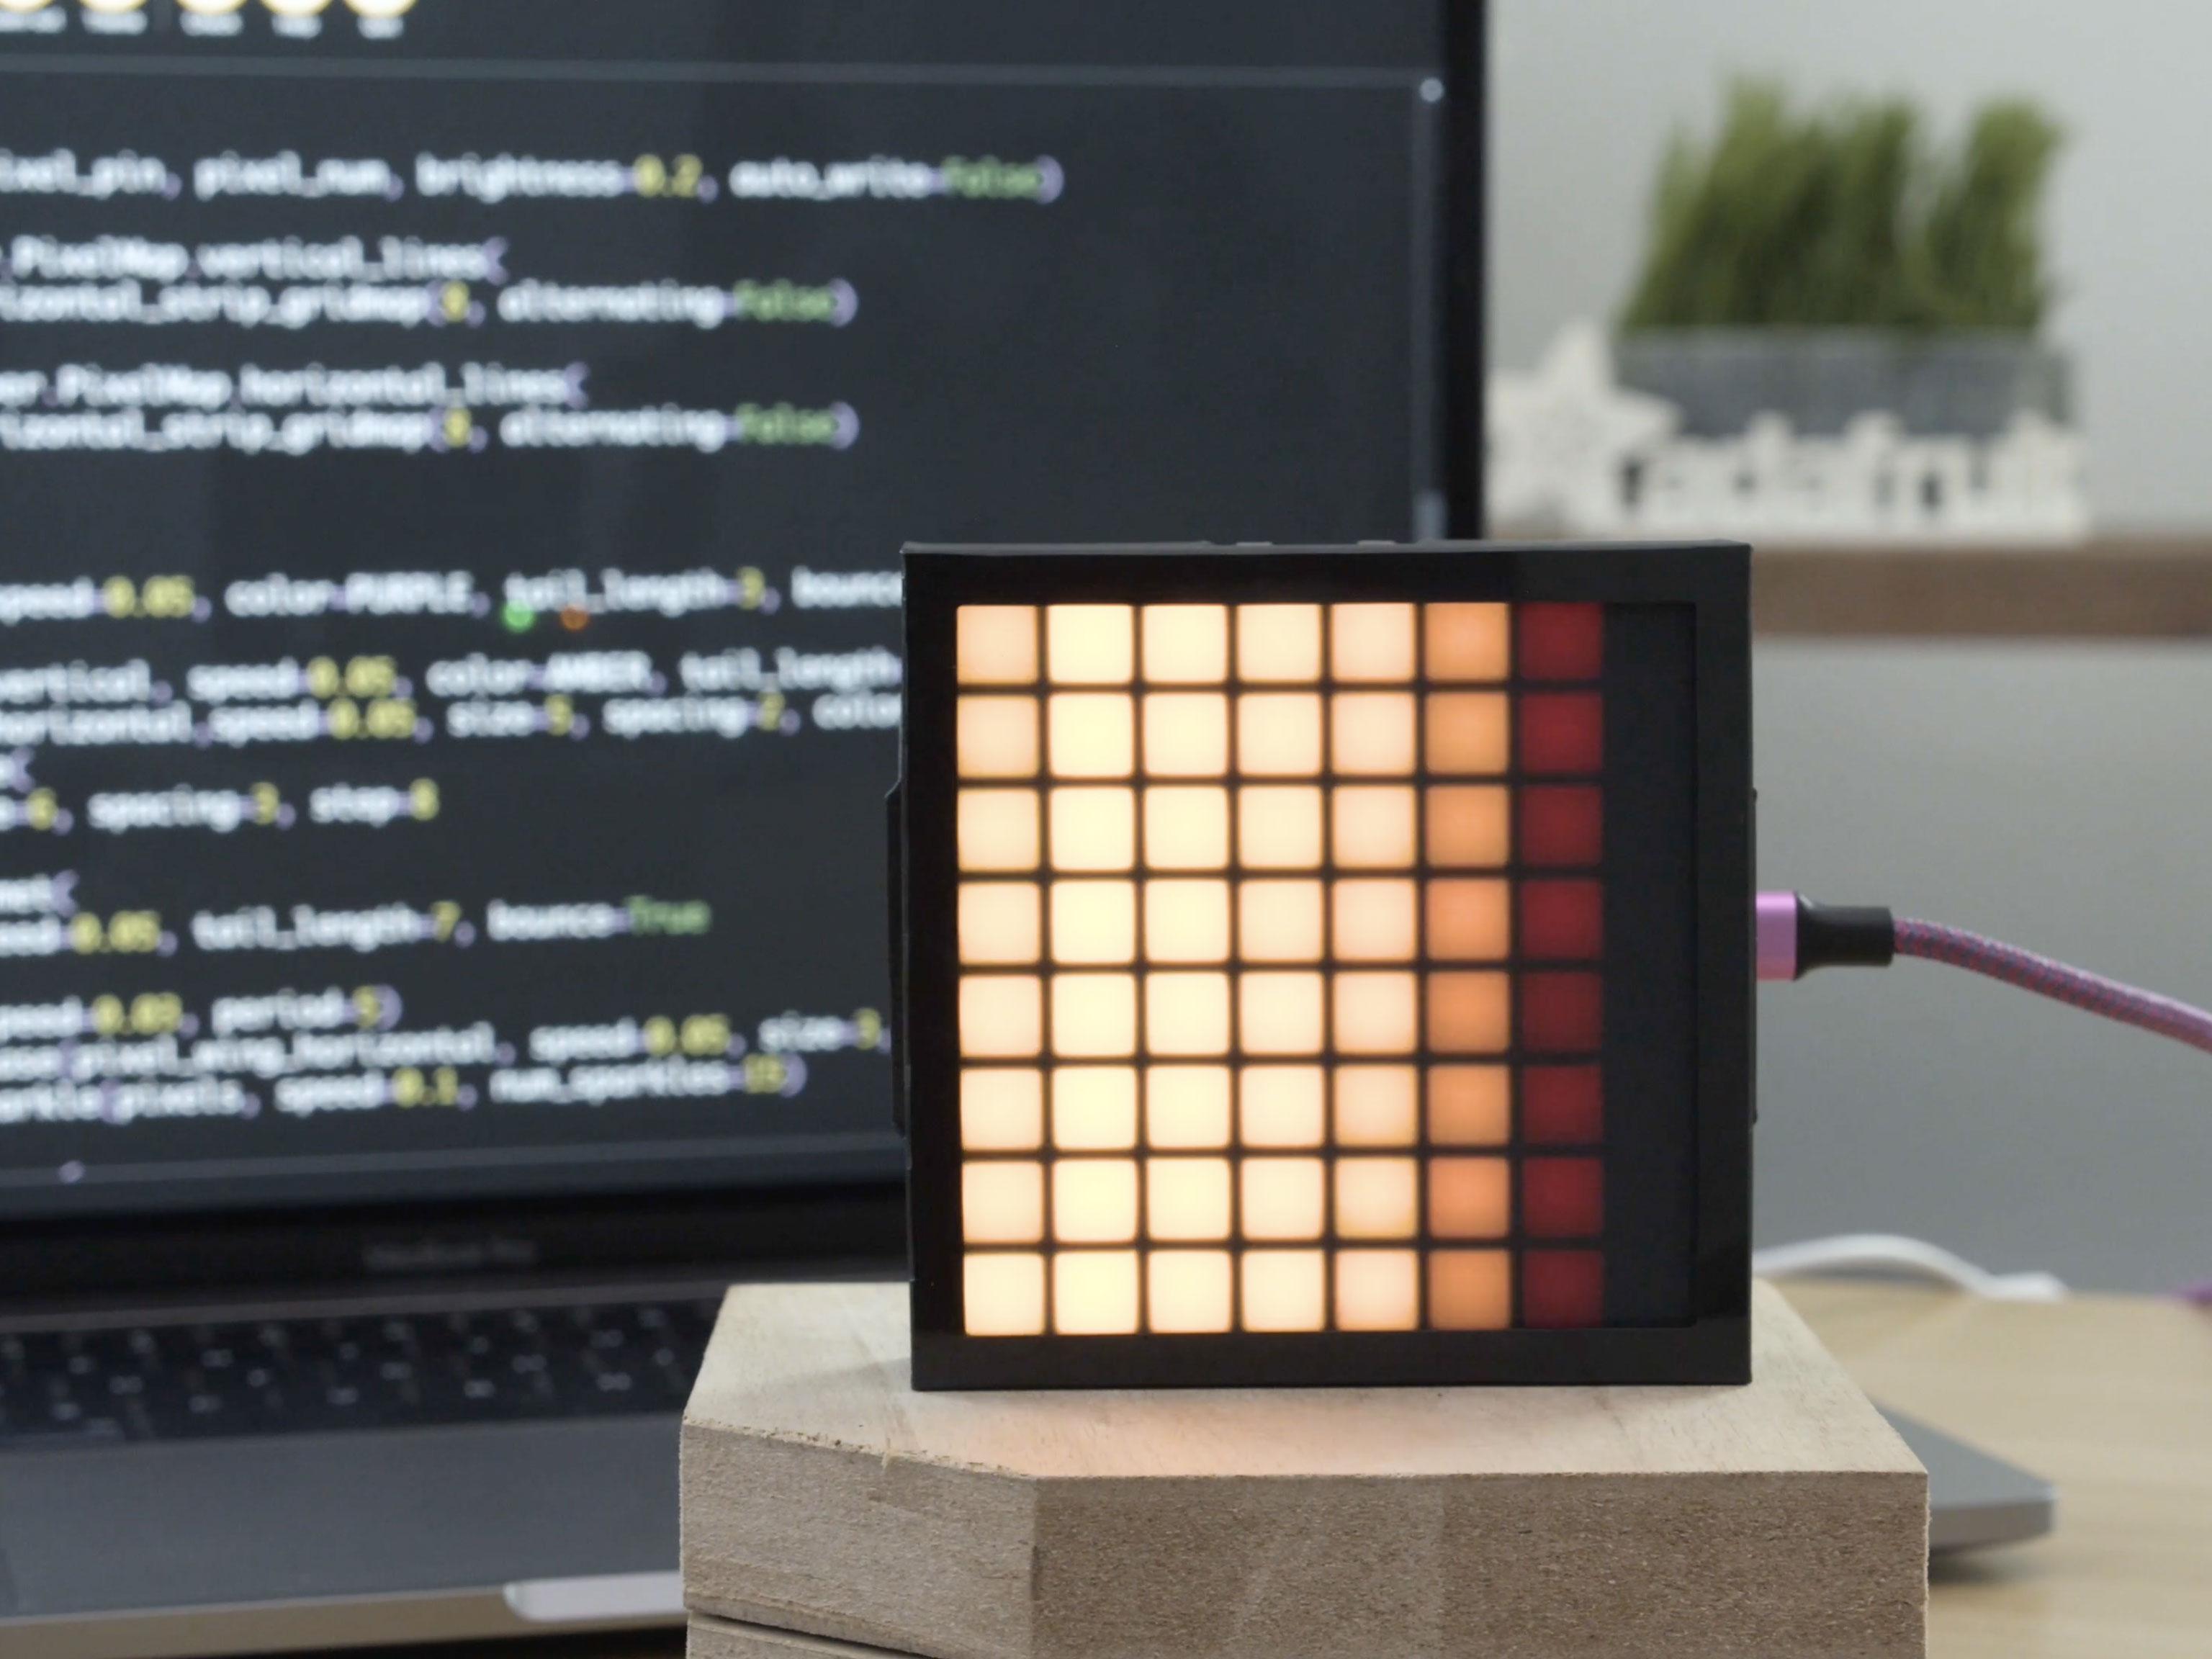 led_matrices_code-orange.jpg